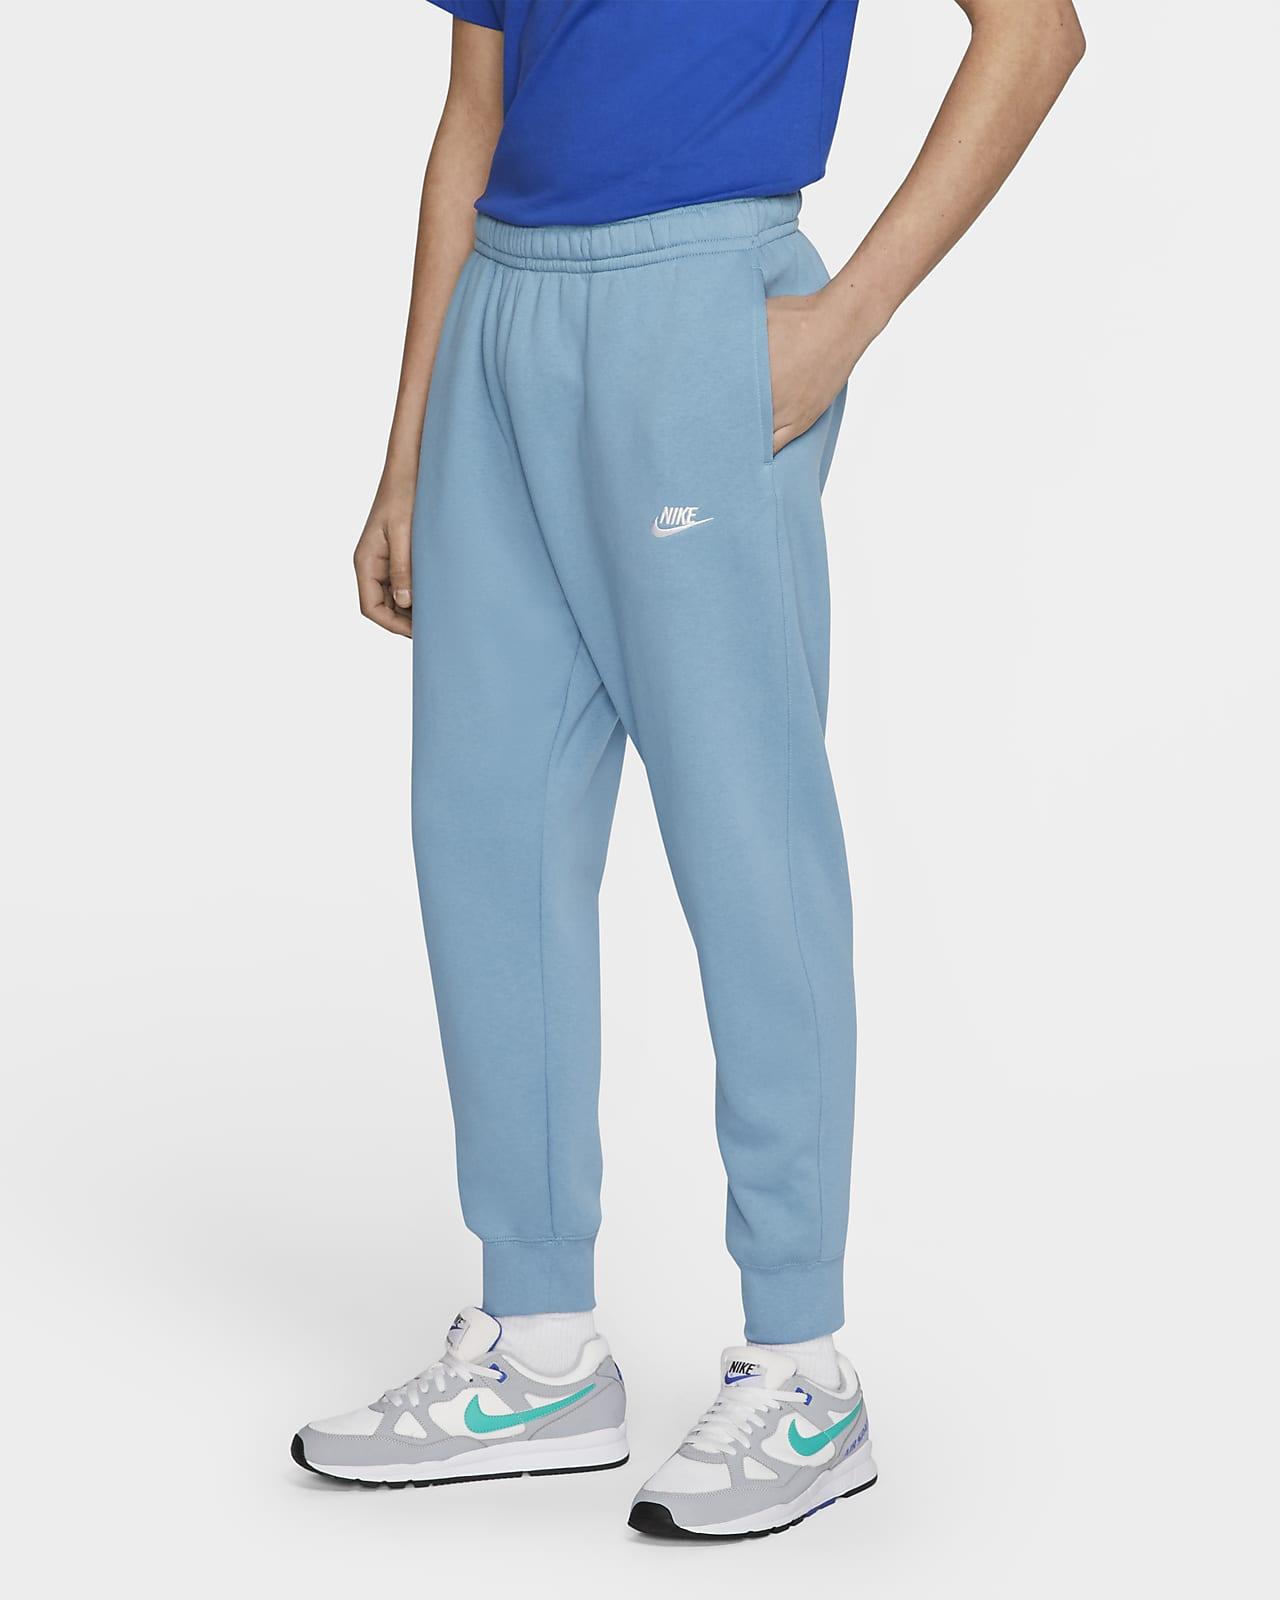 Pantalones de entrenamiento Nike Sportswear Club Fleece